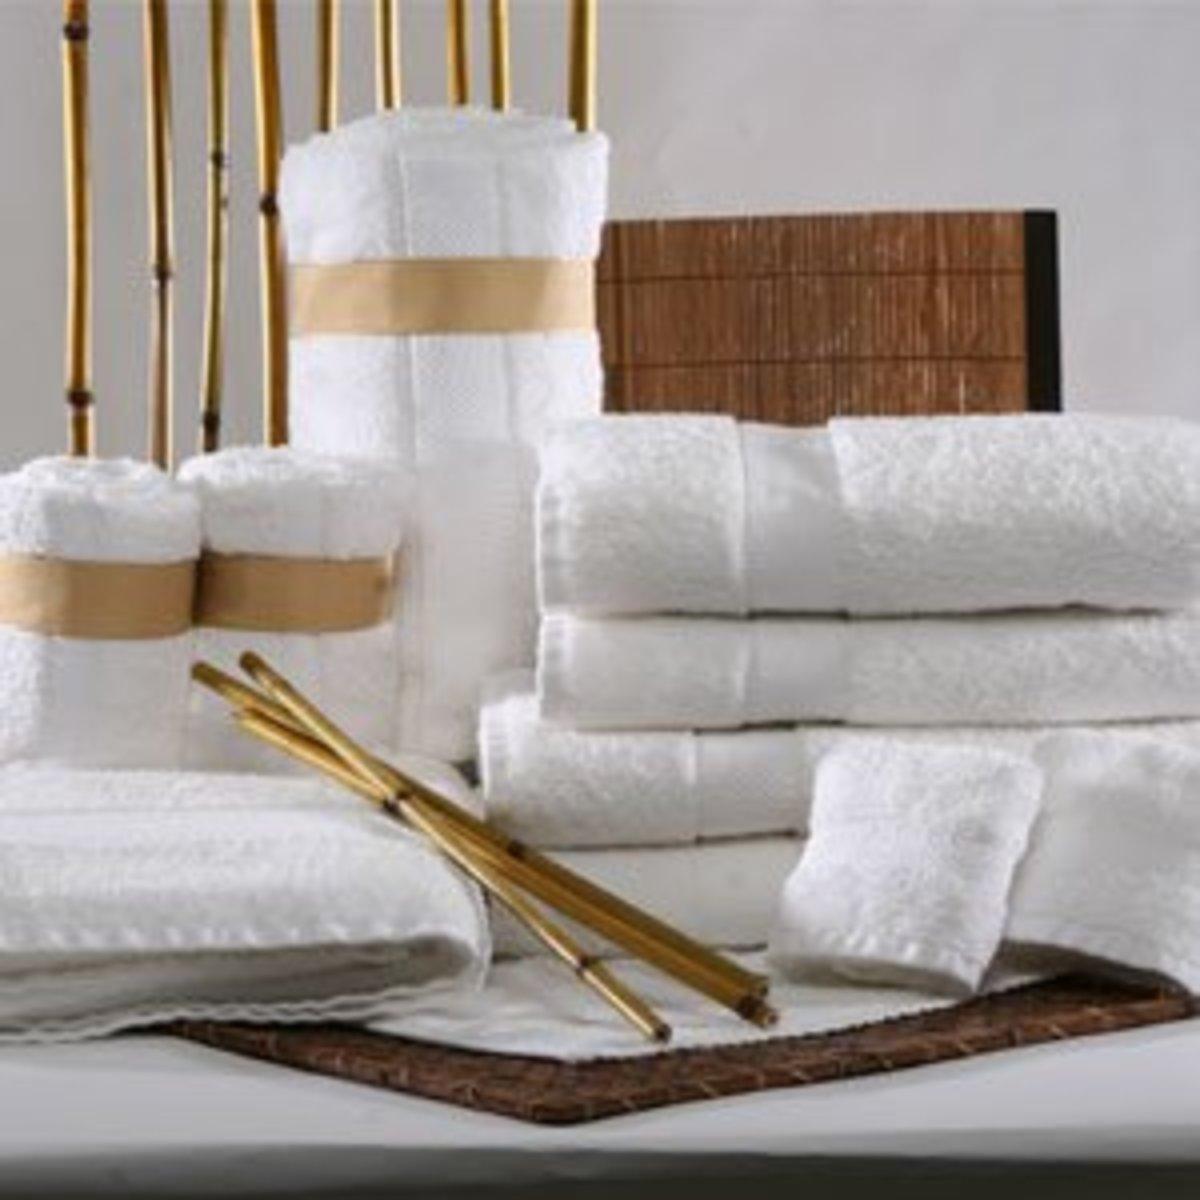 Best Luxury Bath Towels 2014 Cotton Vs. Bamboo